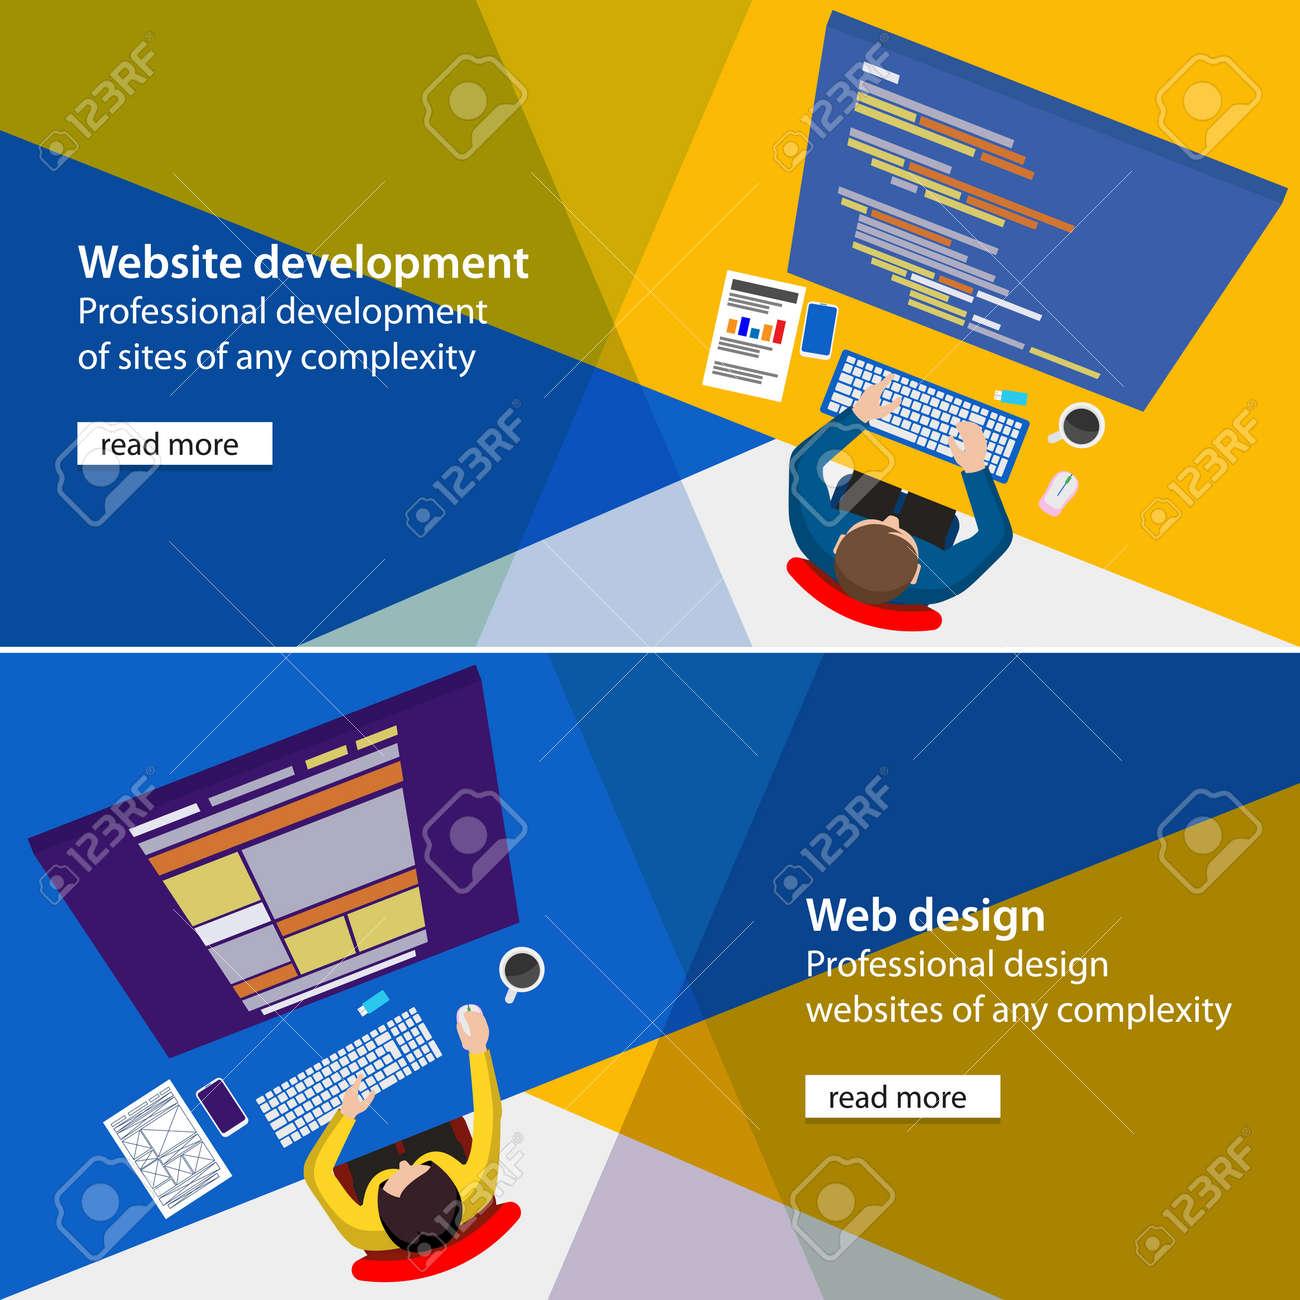 Free banner images for website - Banner Development And Design Process Programmer Site Flat Website Development And Design Process Illustration